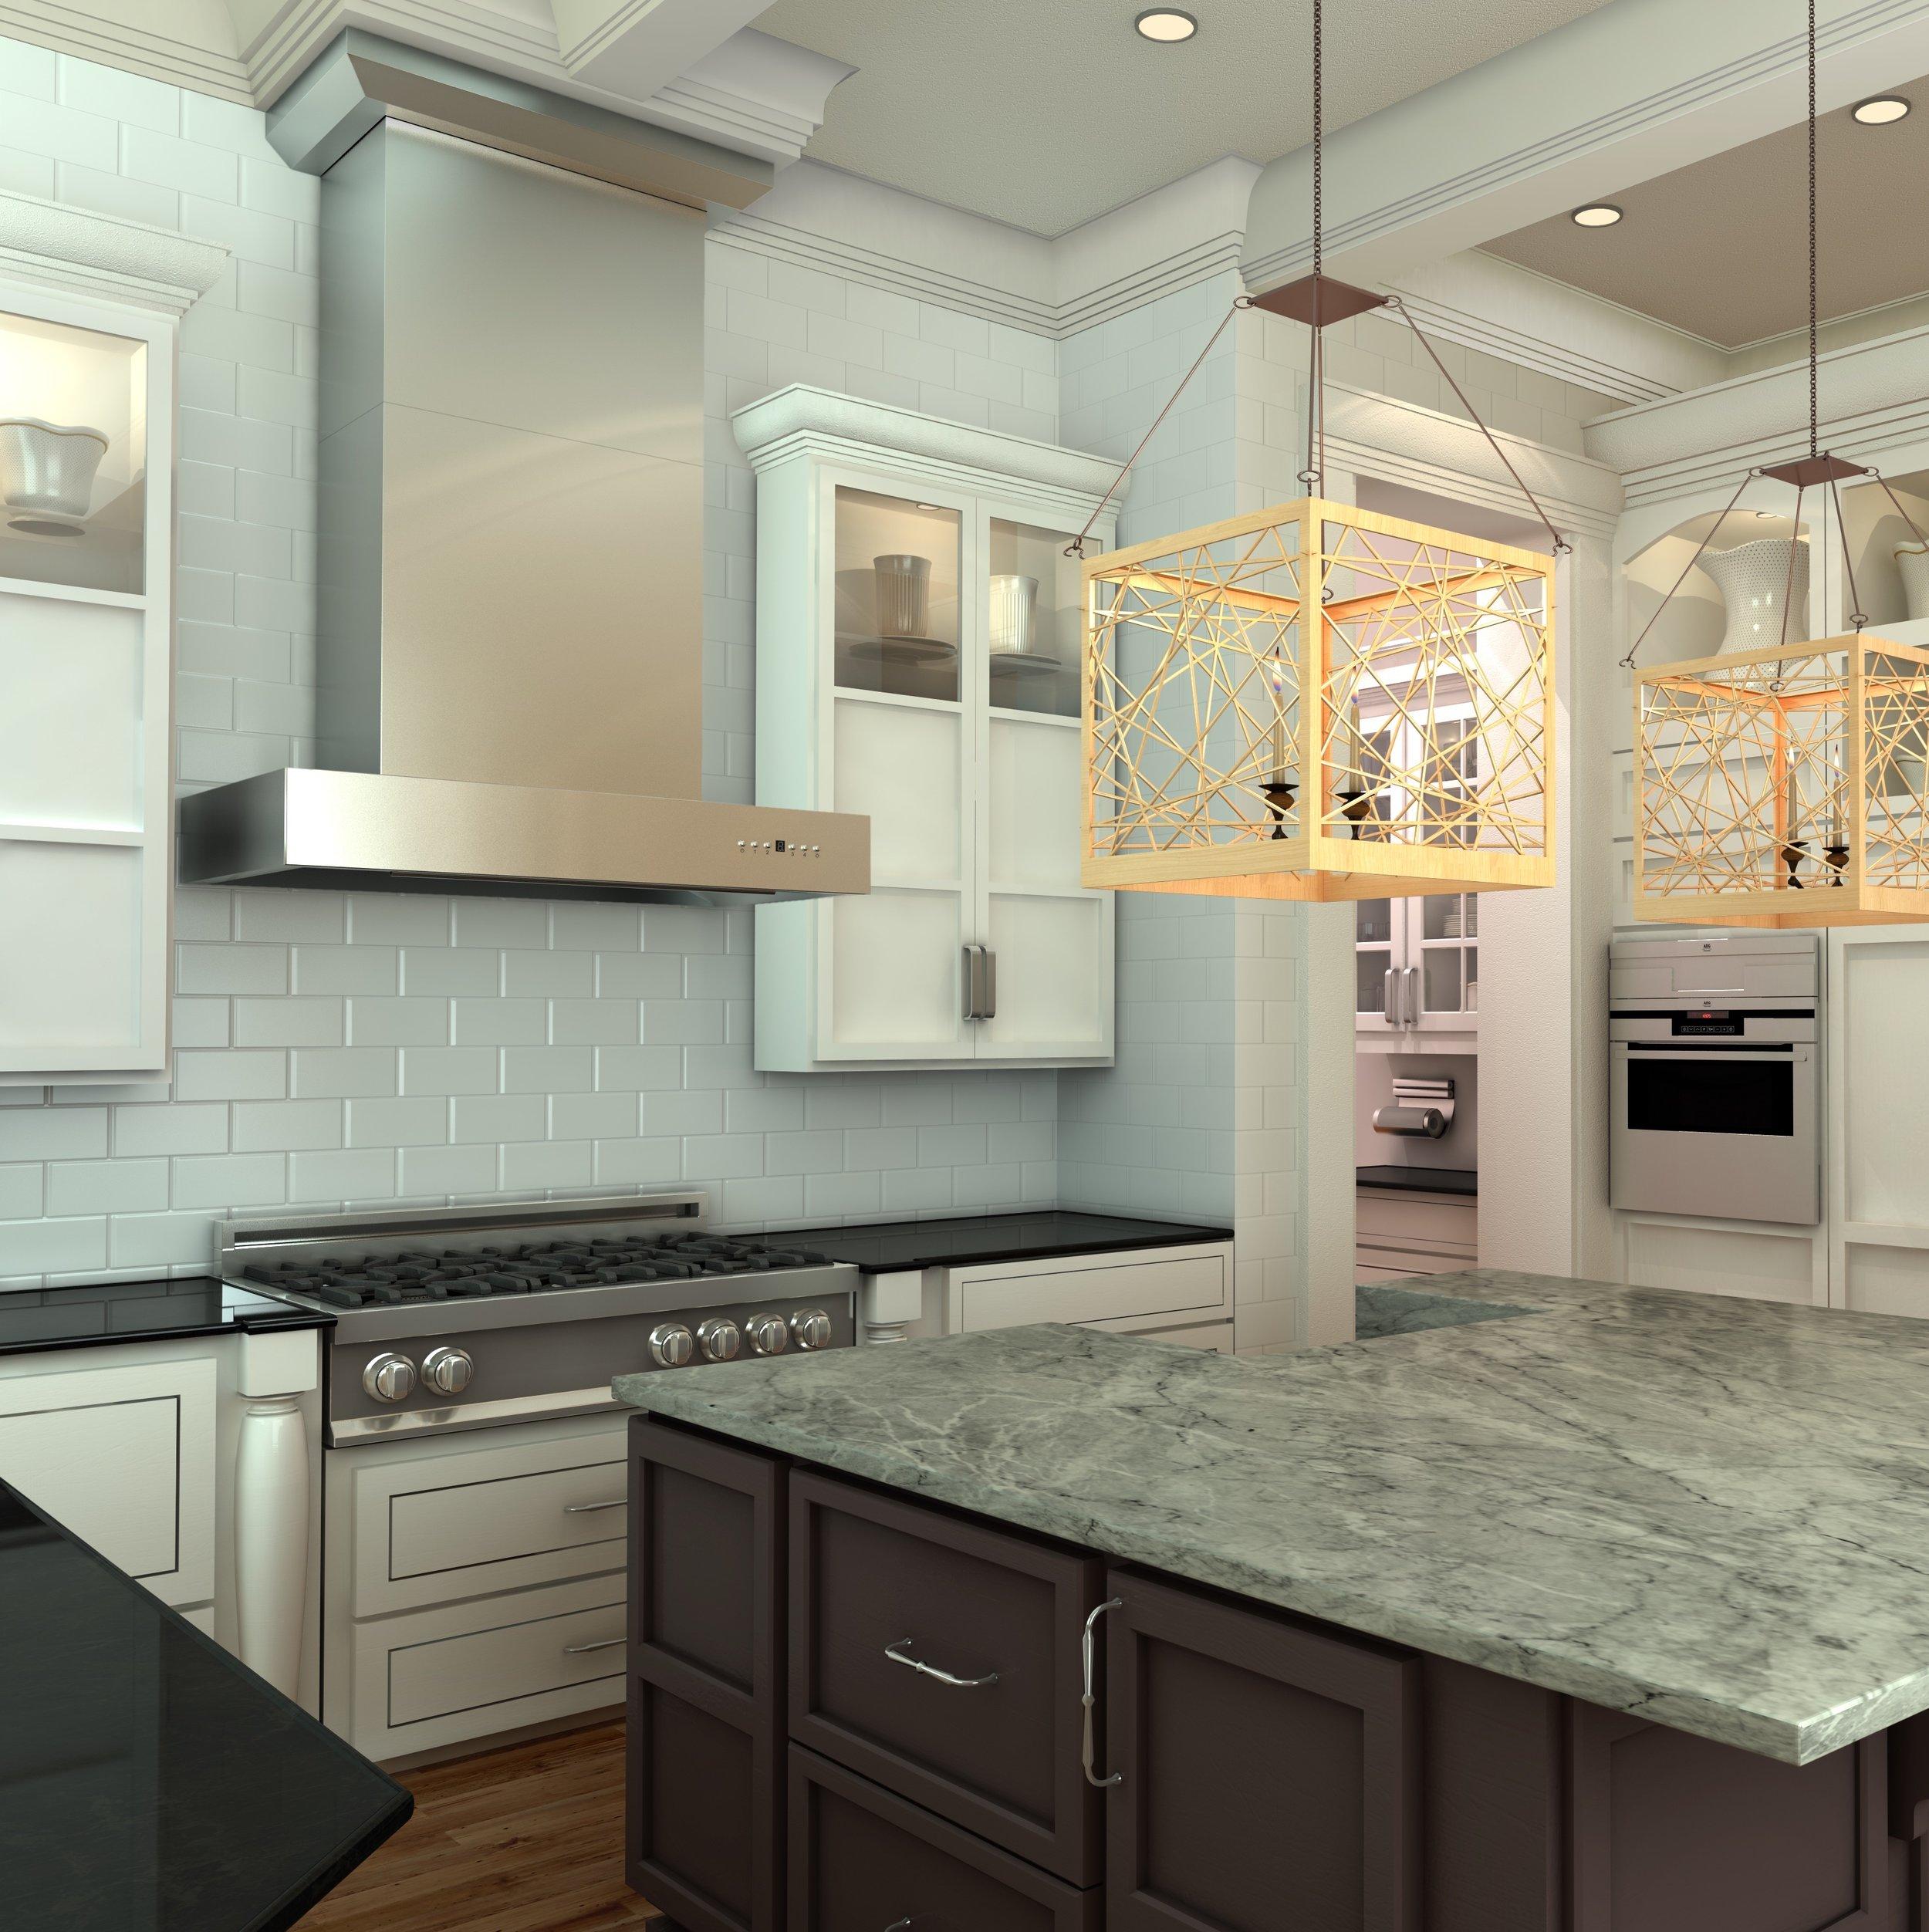 zline-stainless-steel-wall-mounted-range-hood-KECOM-kitchen 2.jpeg